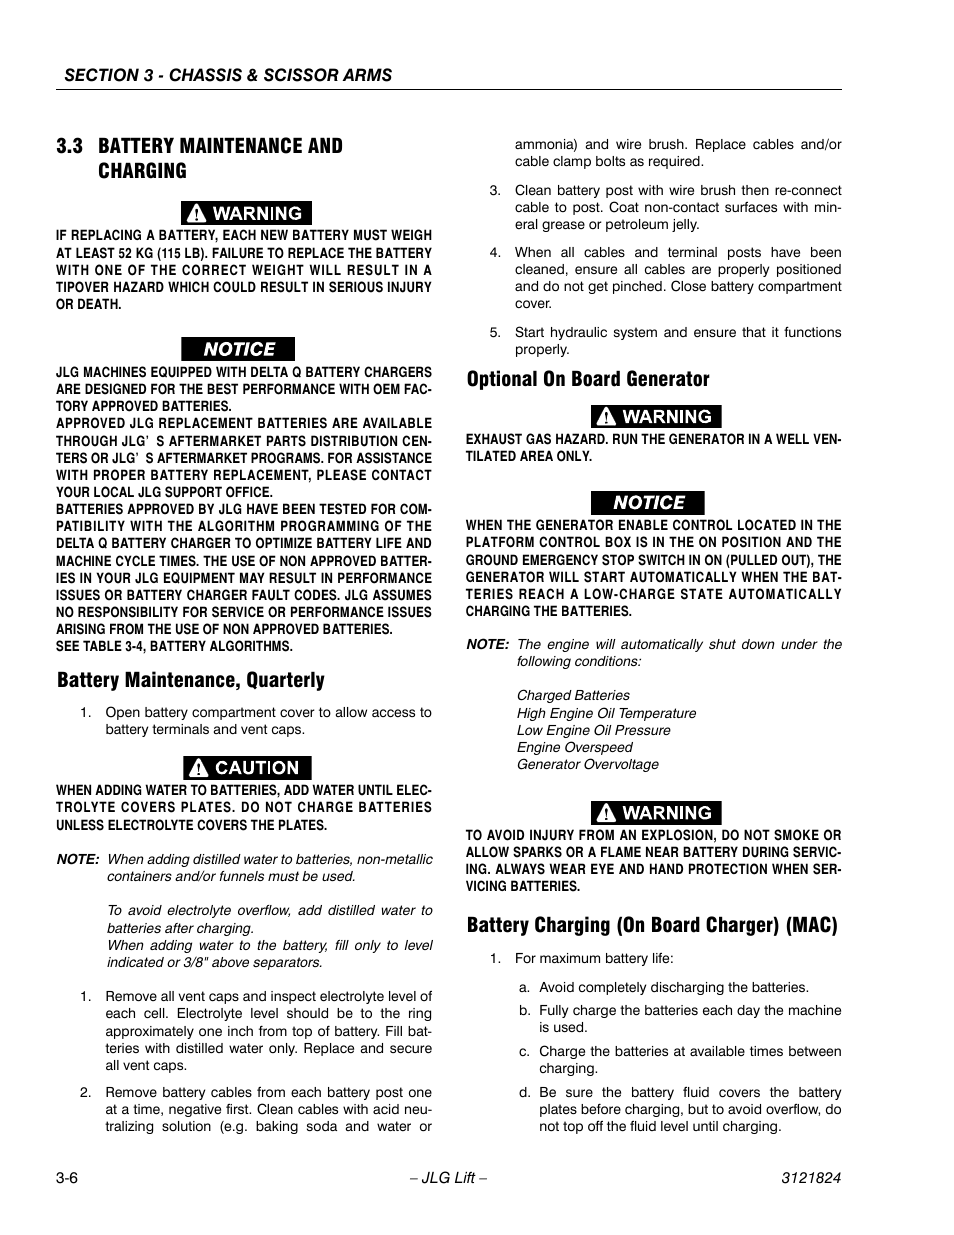 Hydraulic Generator Maintenance Manual Block Diagram System Black And White Tv